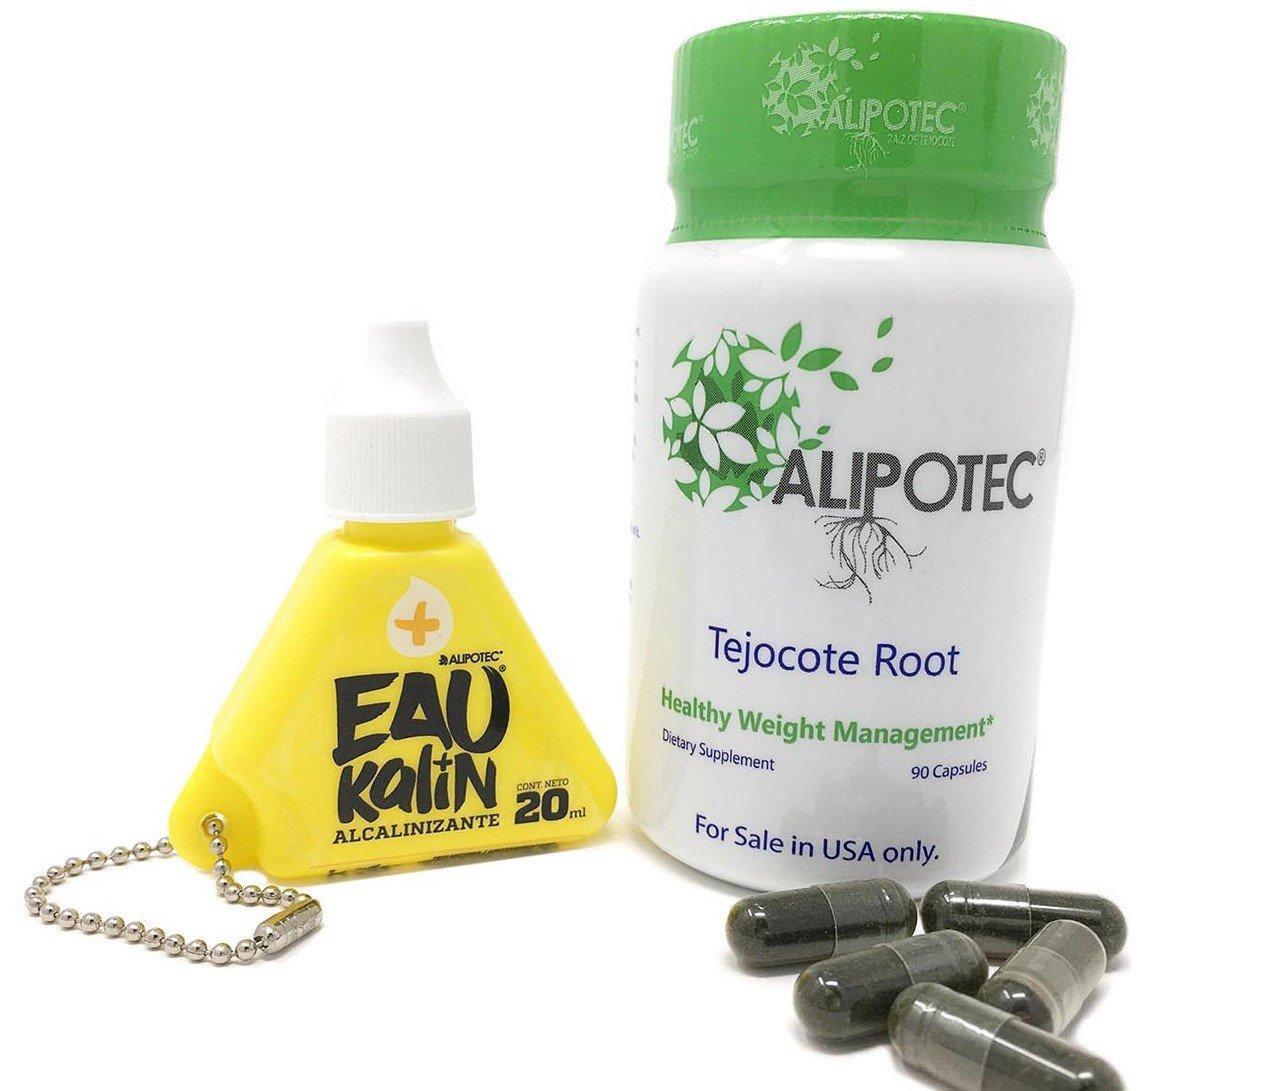 Alipotec Capsules Tejocote Root Supplement Capsulas Alipotec Raiz de Tejocote 90 Day Supply and Eau Kalin